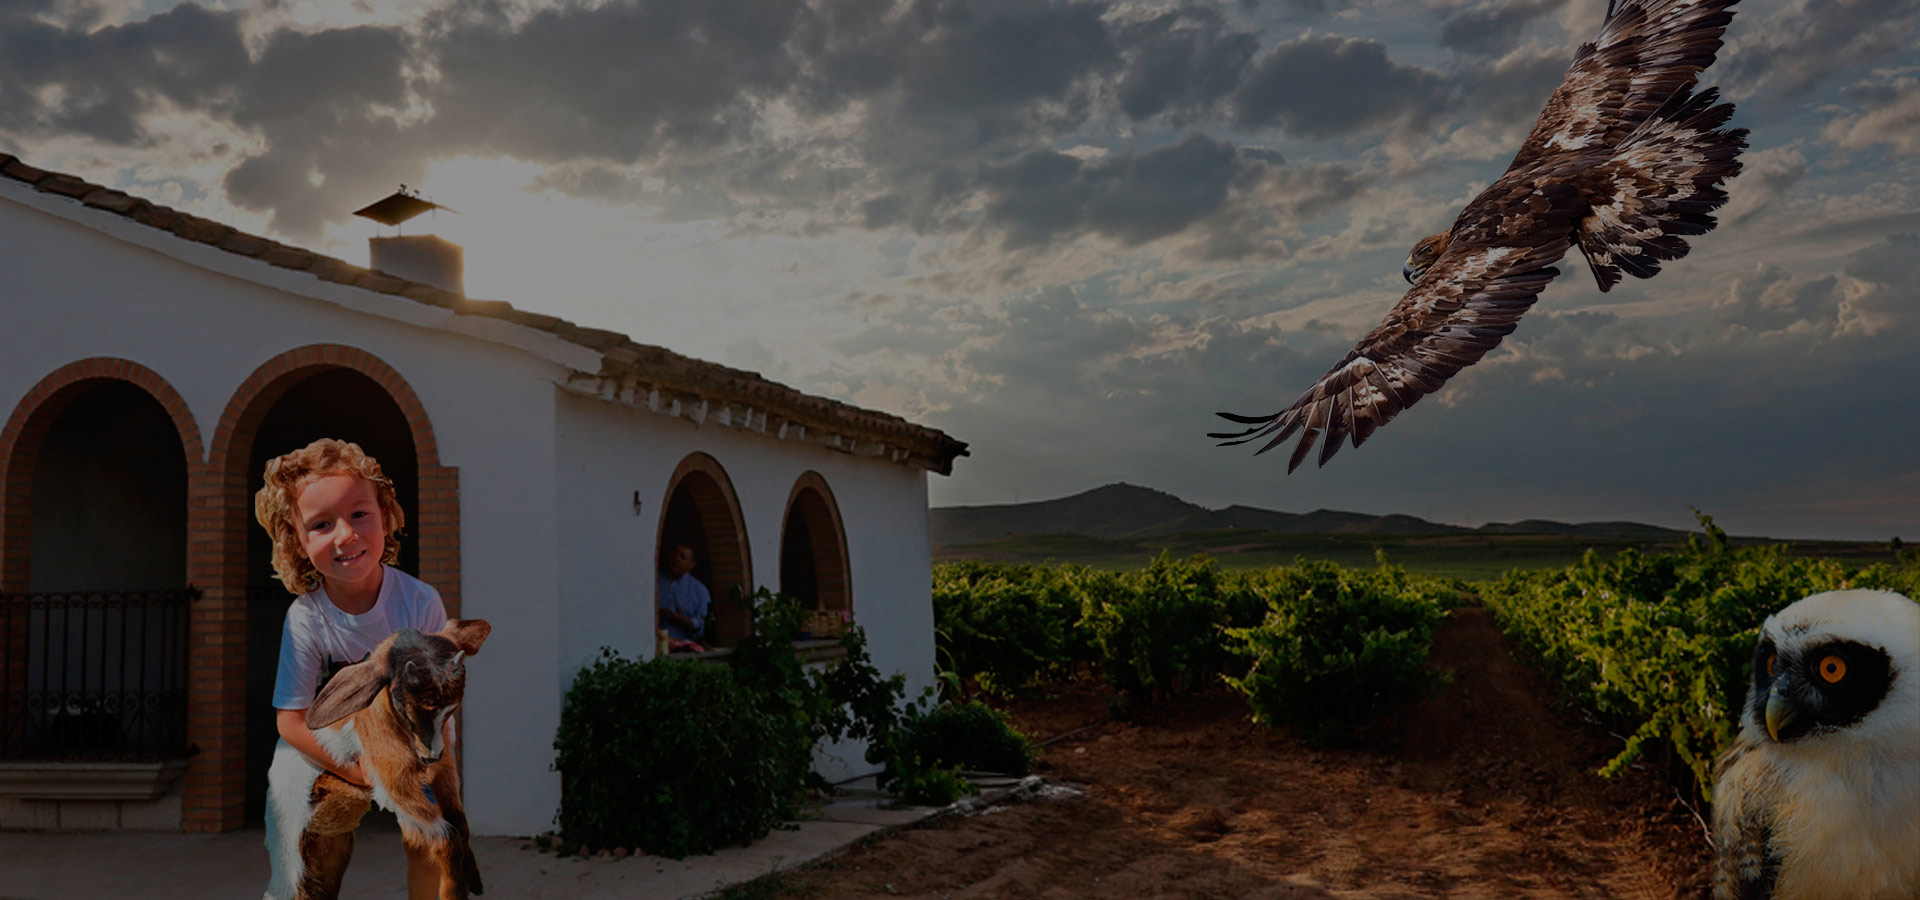 Fin de Semana en La Rioja con Cata Rapaz. Tierra Rapaz + Cata de Vino + Hotel